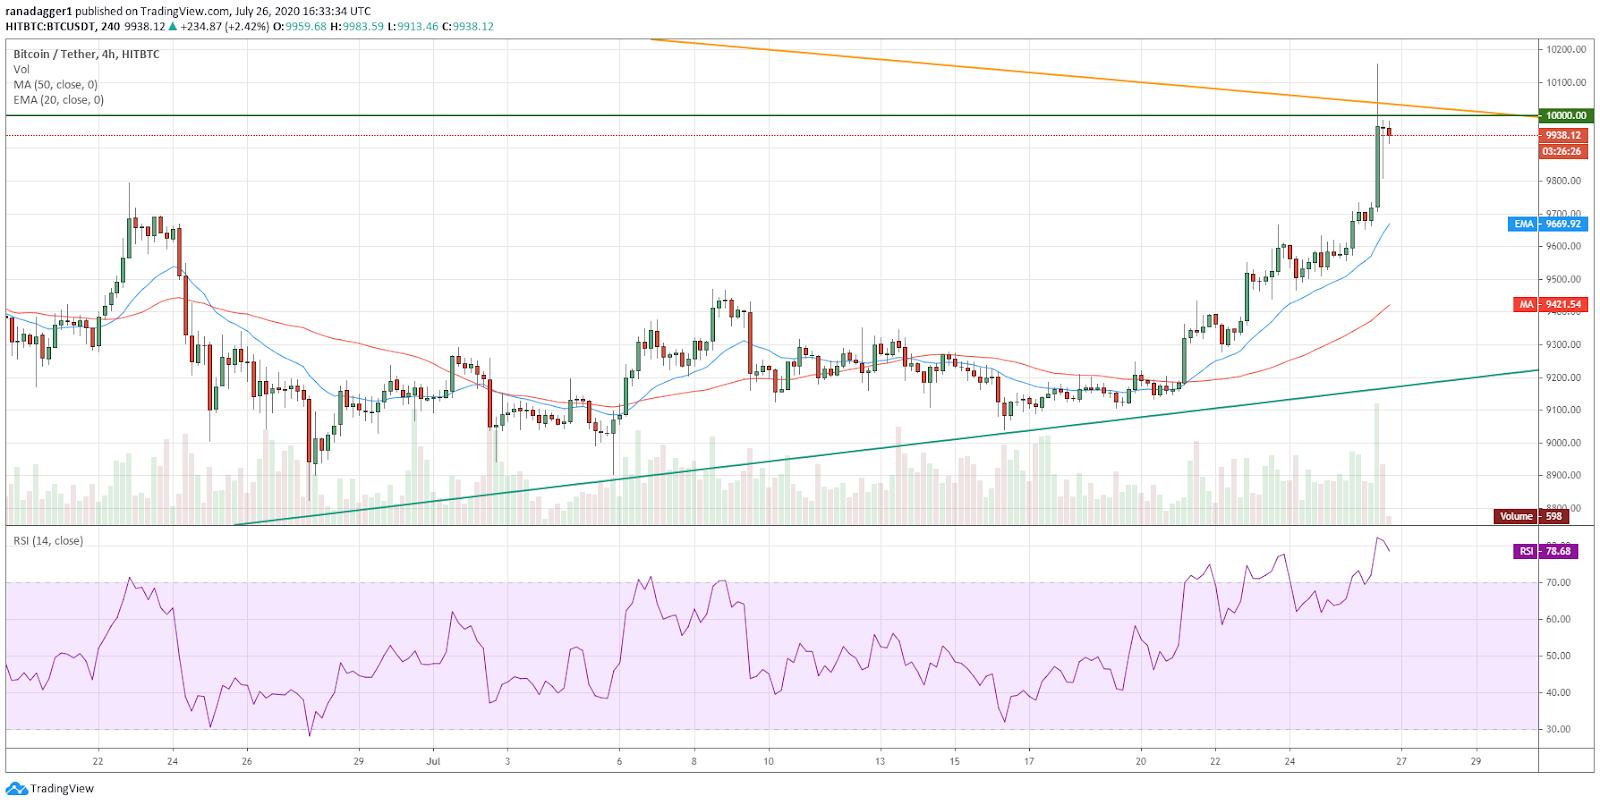 BTC/USD 4-hour chart